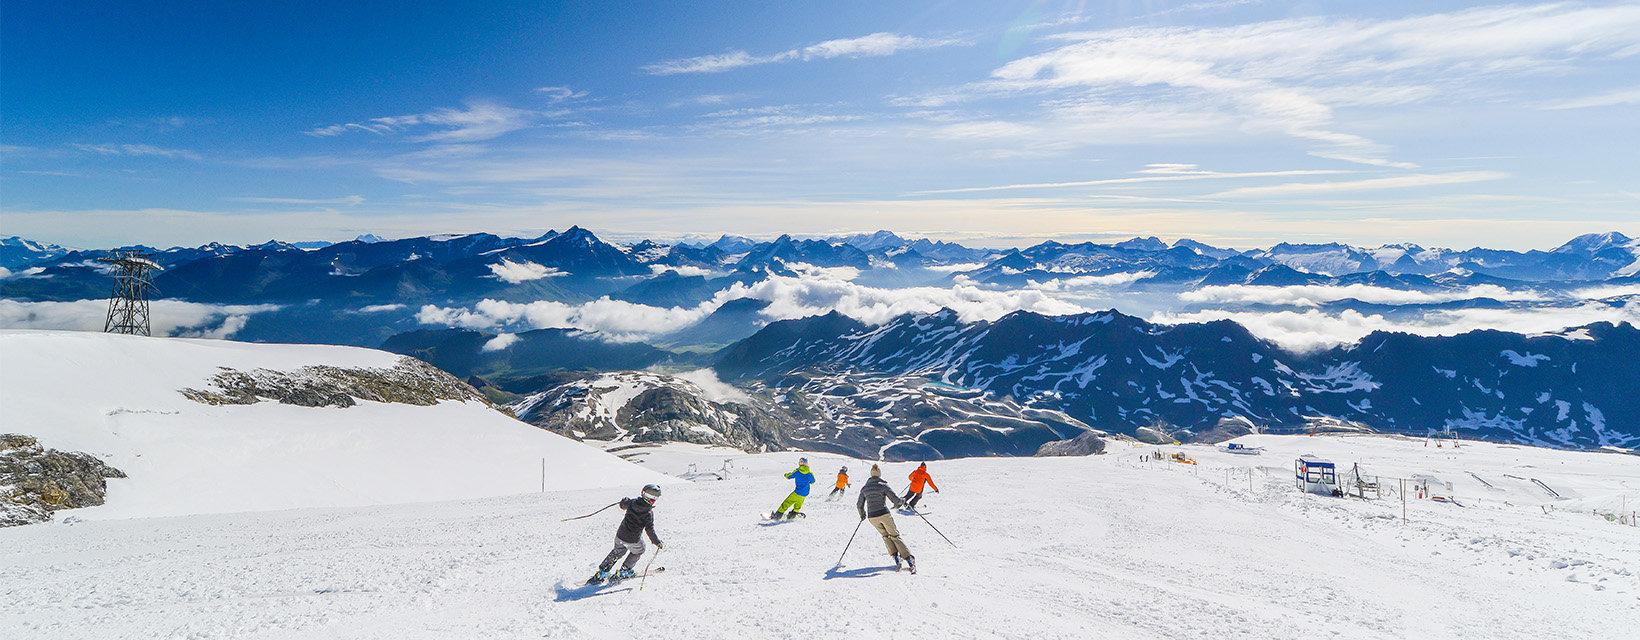 Spring skiing on Tignes' Grande Motte Glacier - © Maison de Tignes